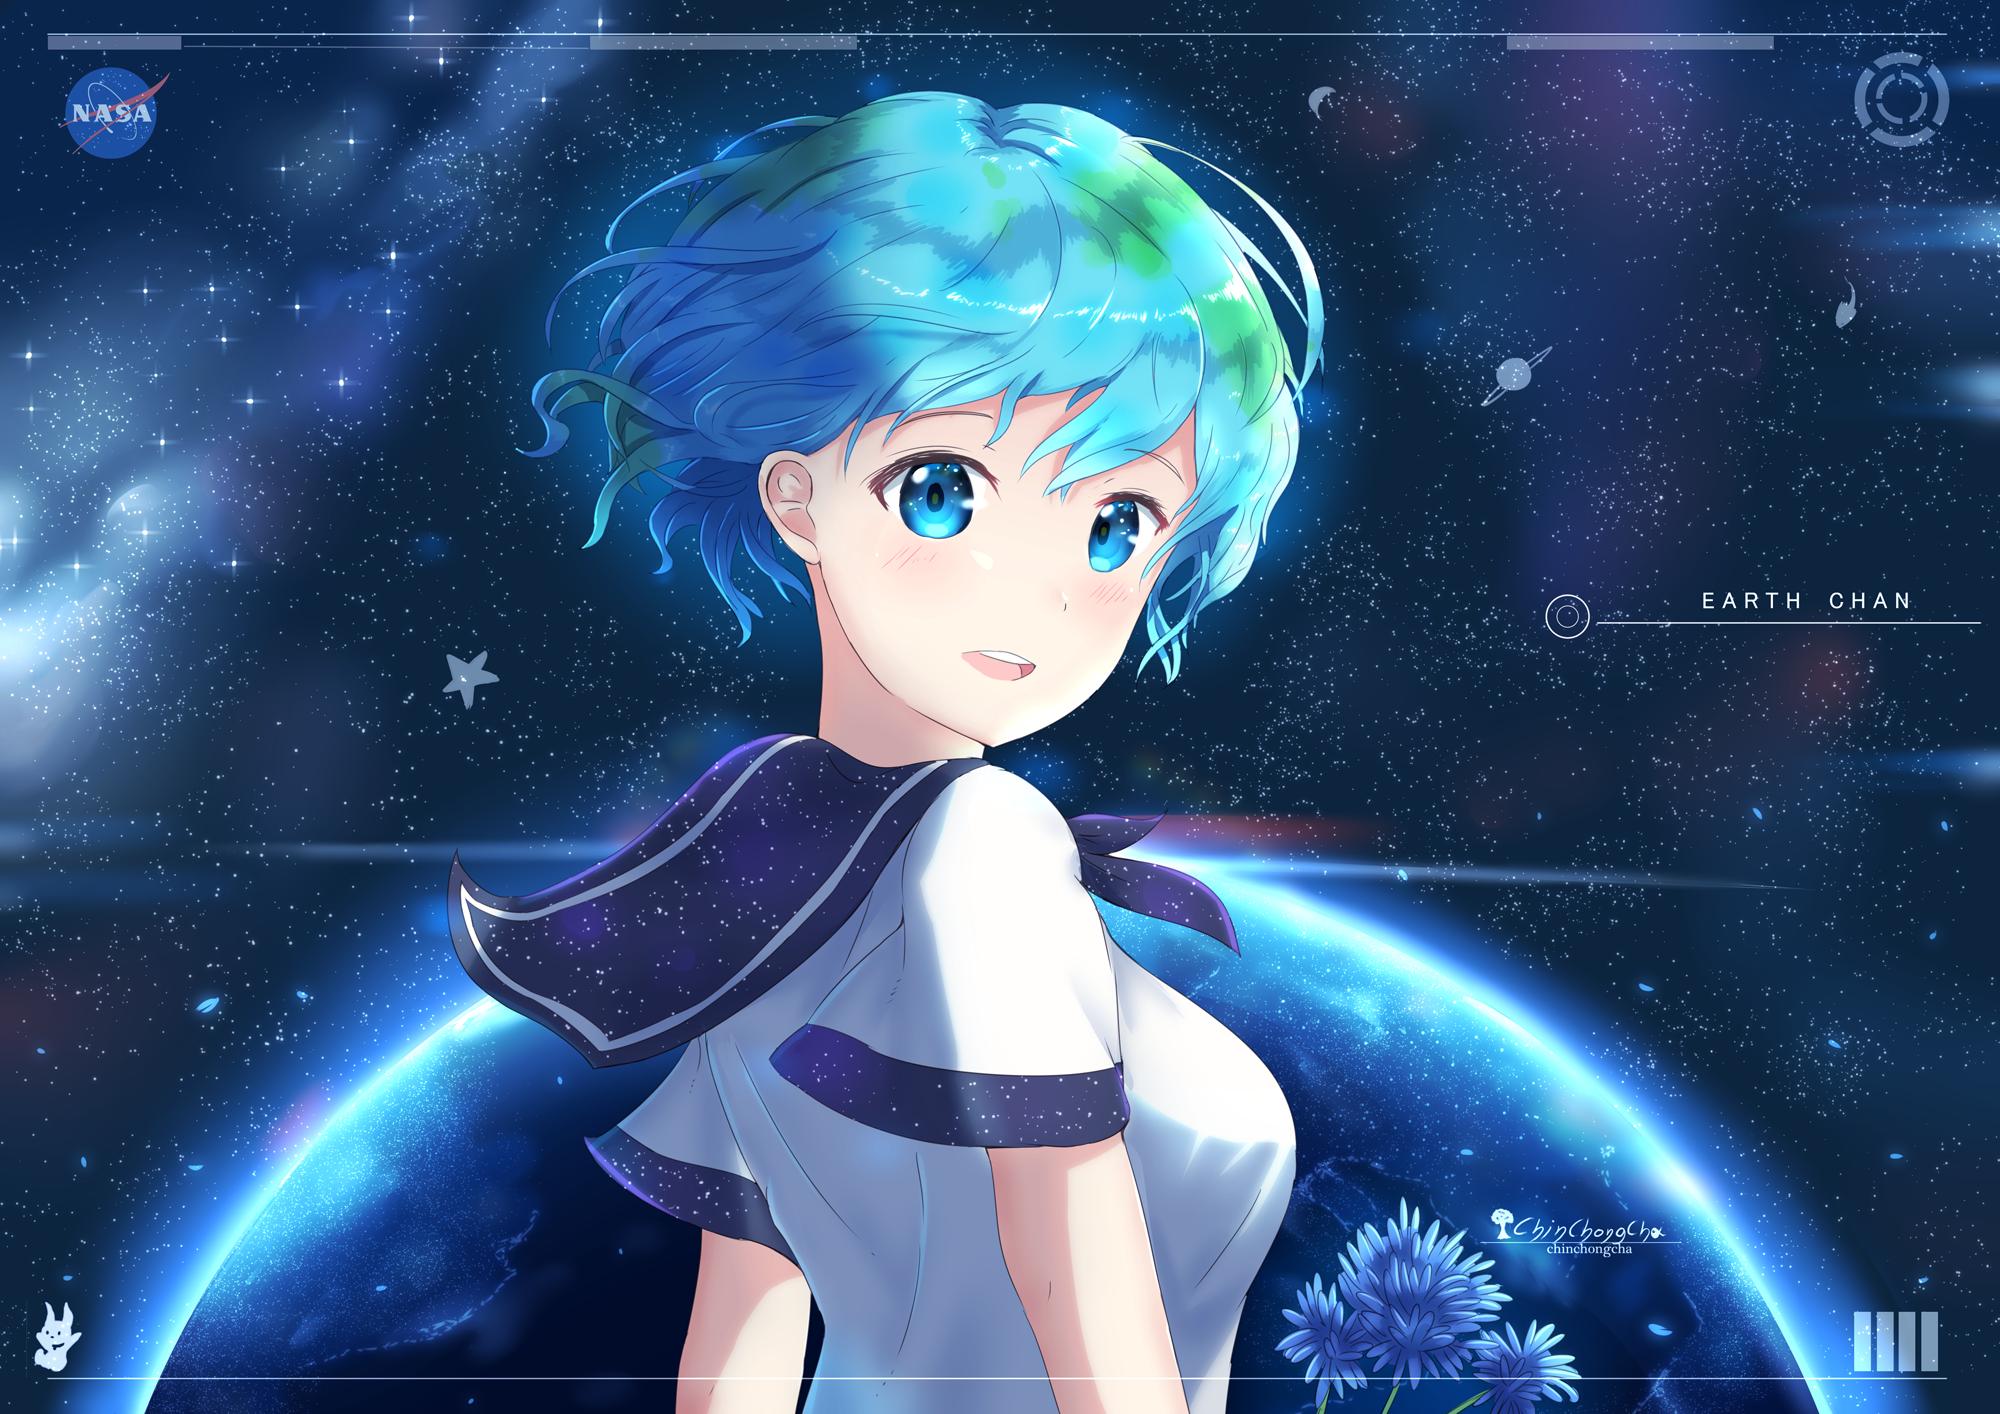 Hd Wallpaper Background Image Id X Anime Earth Chan